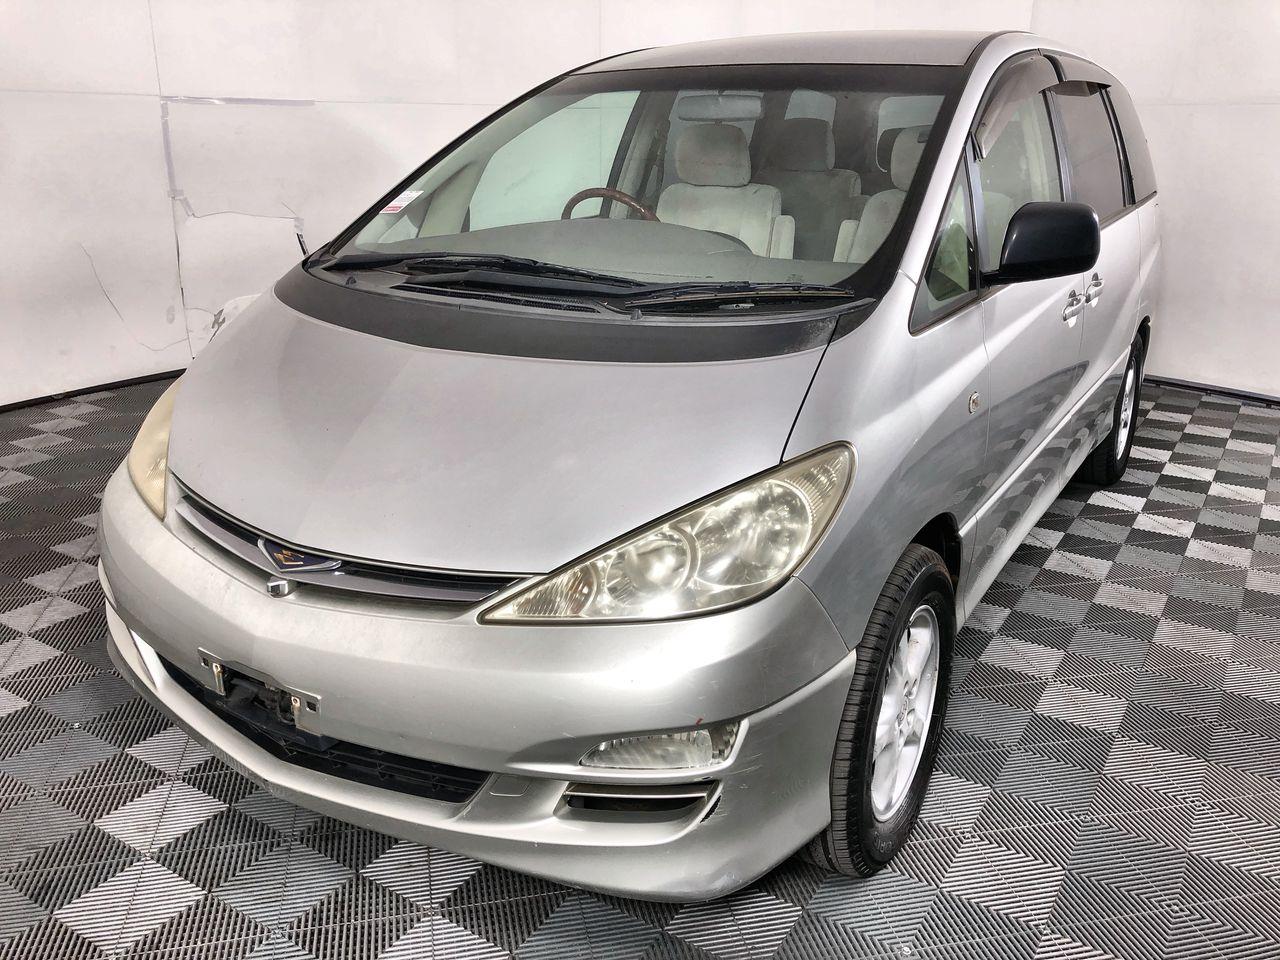 2005 (2012) Toyota Estima (Tarago) Automatic Van (import)